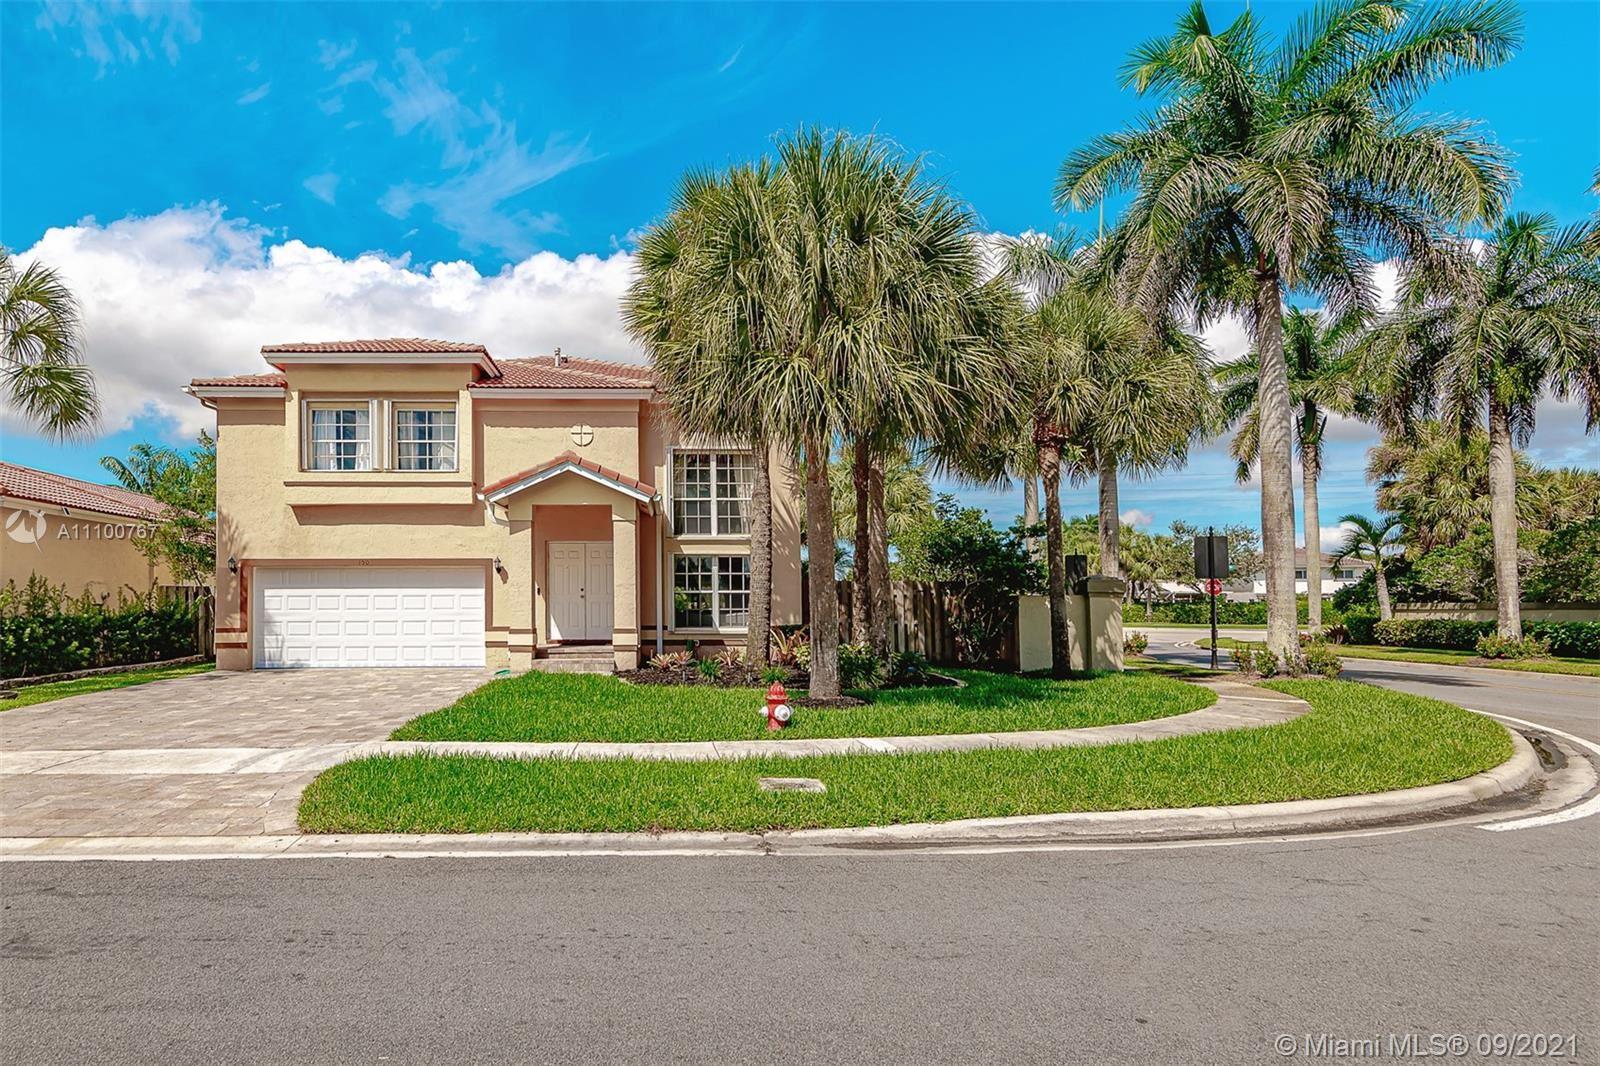 150 Gables Blvd, Weston, FL 33326 - #: A11100767